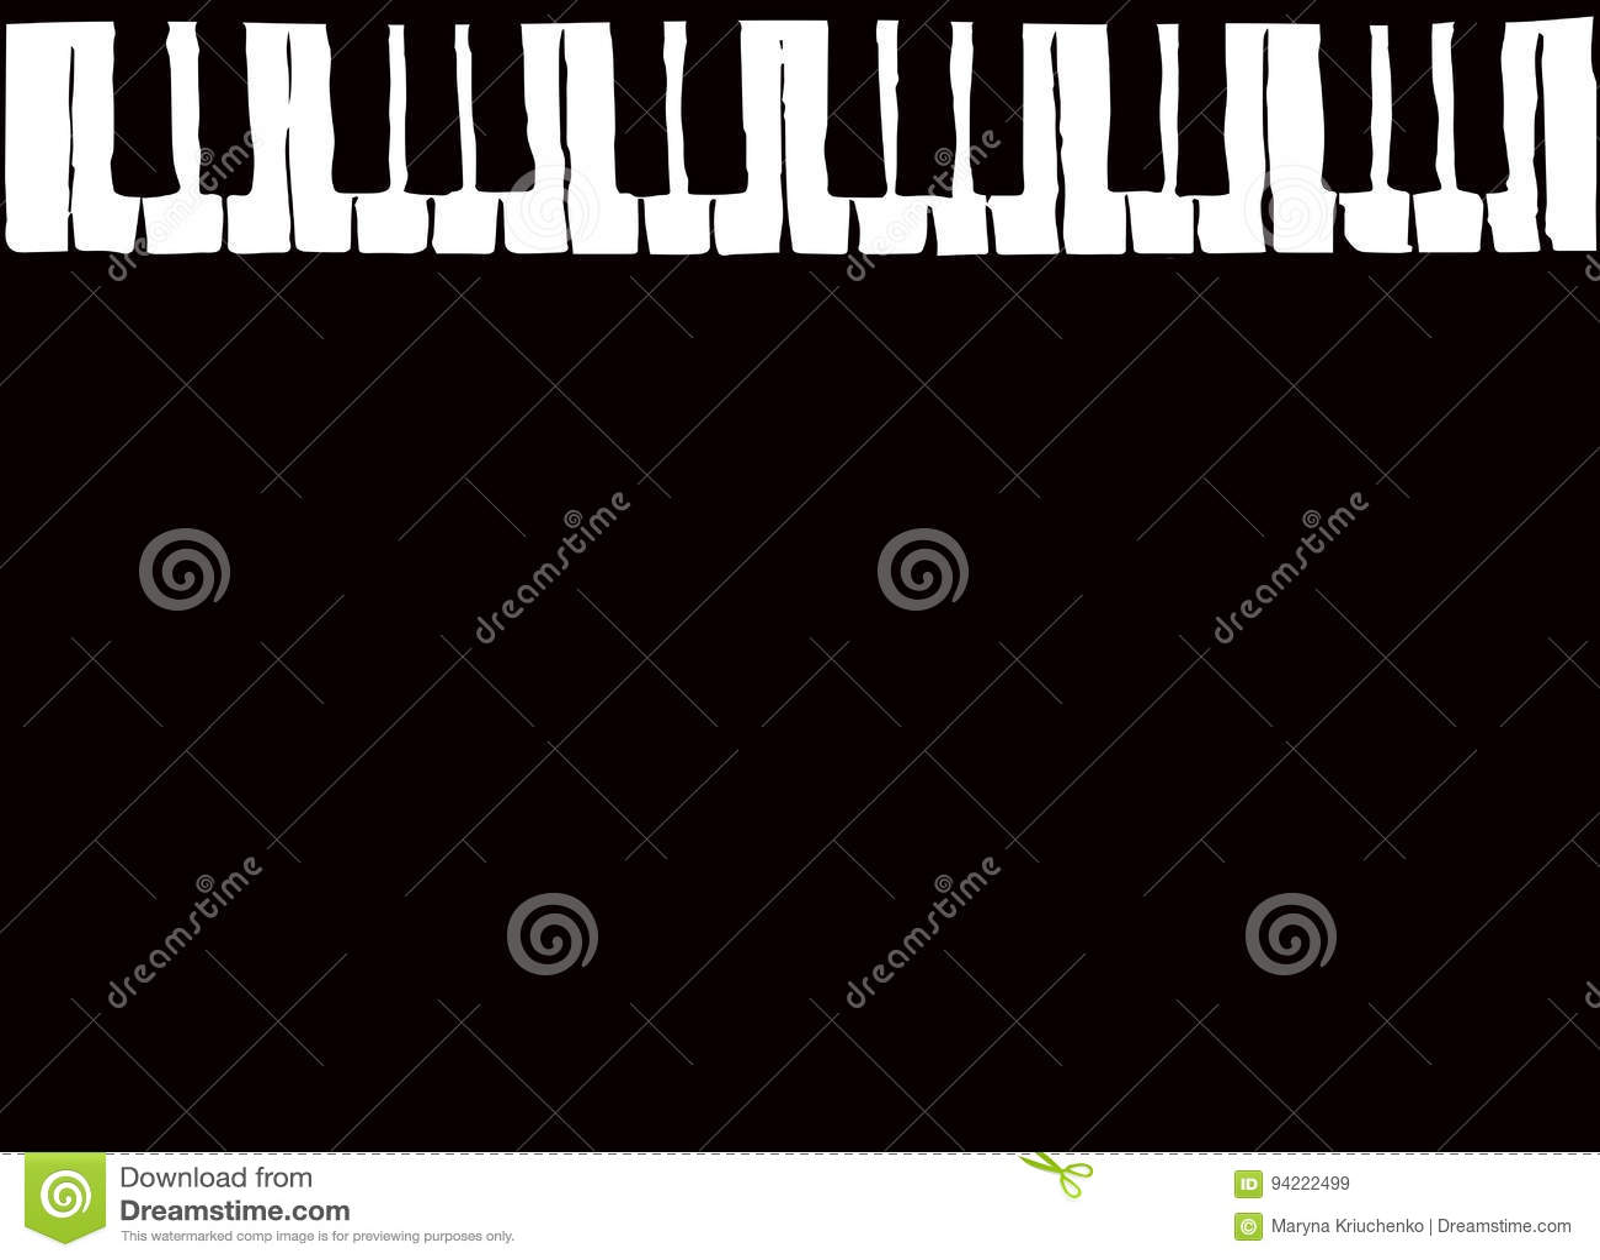 Clavichord Plans Download